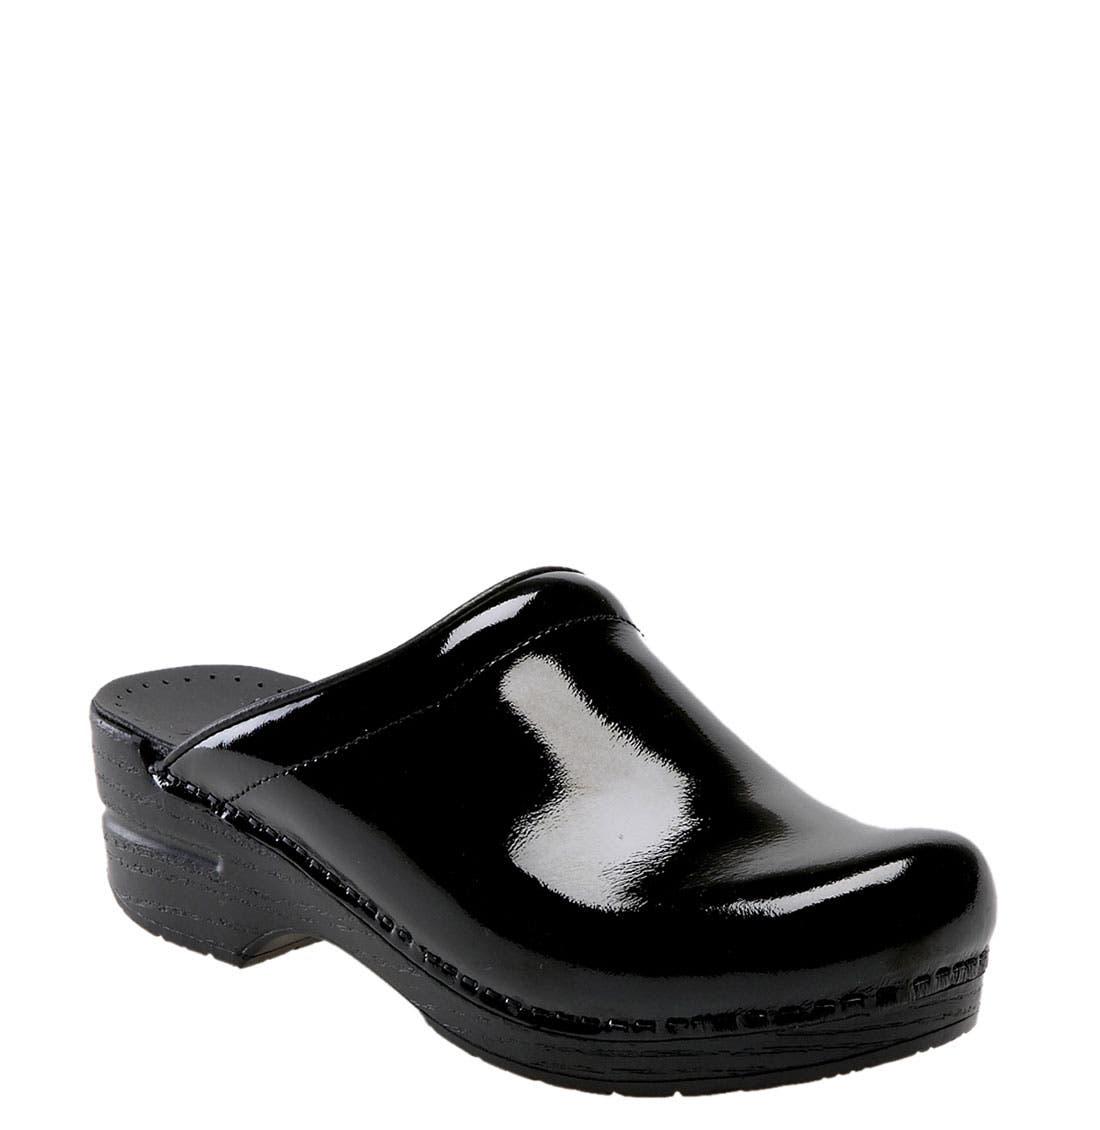 Dansko 'Sonja' Patent Leather Clog